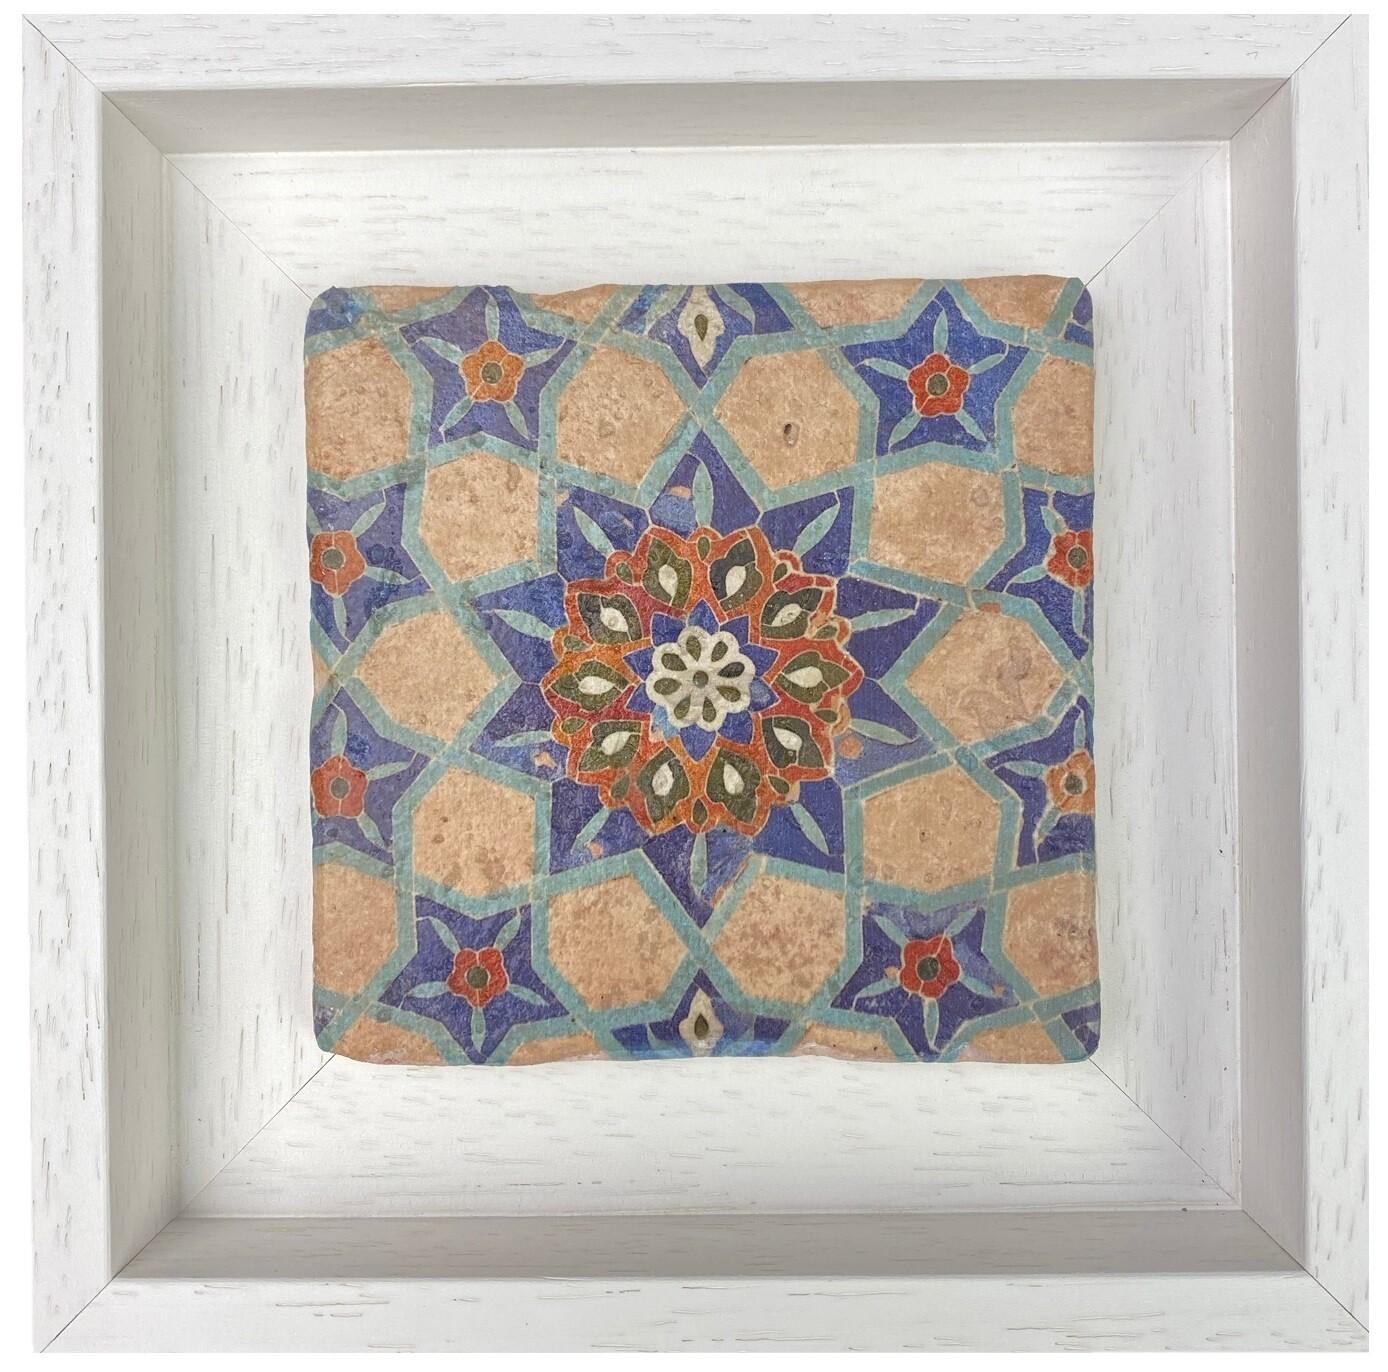 Azure Blue and Sandy Floral Samarkandi Geometric Stone Tile